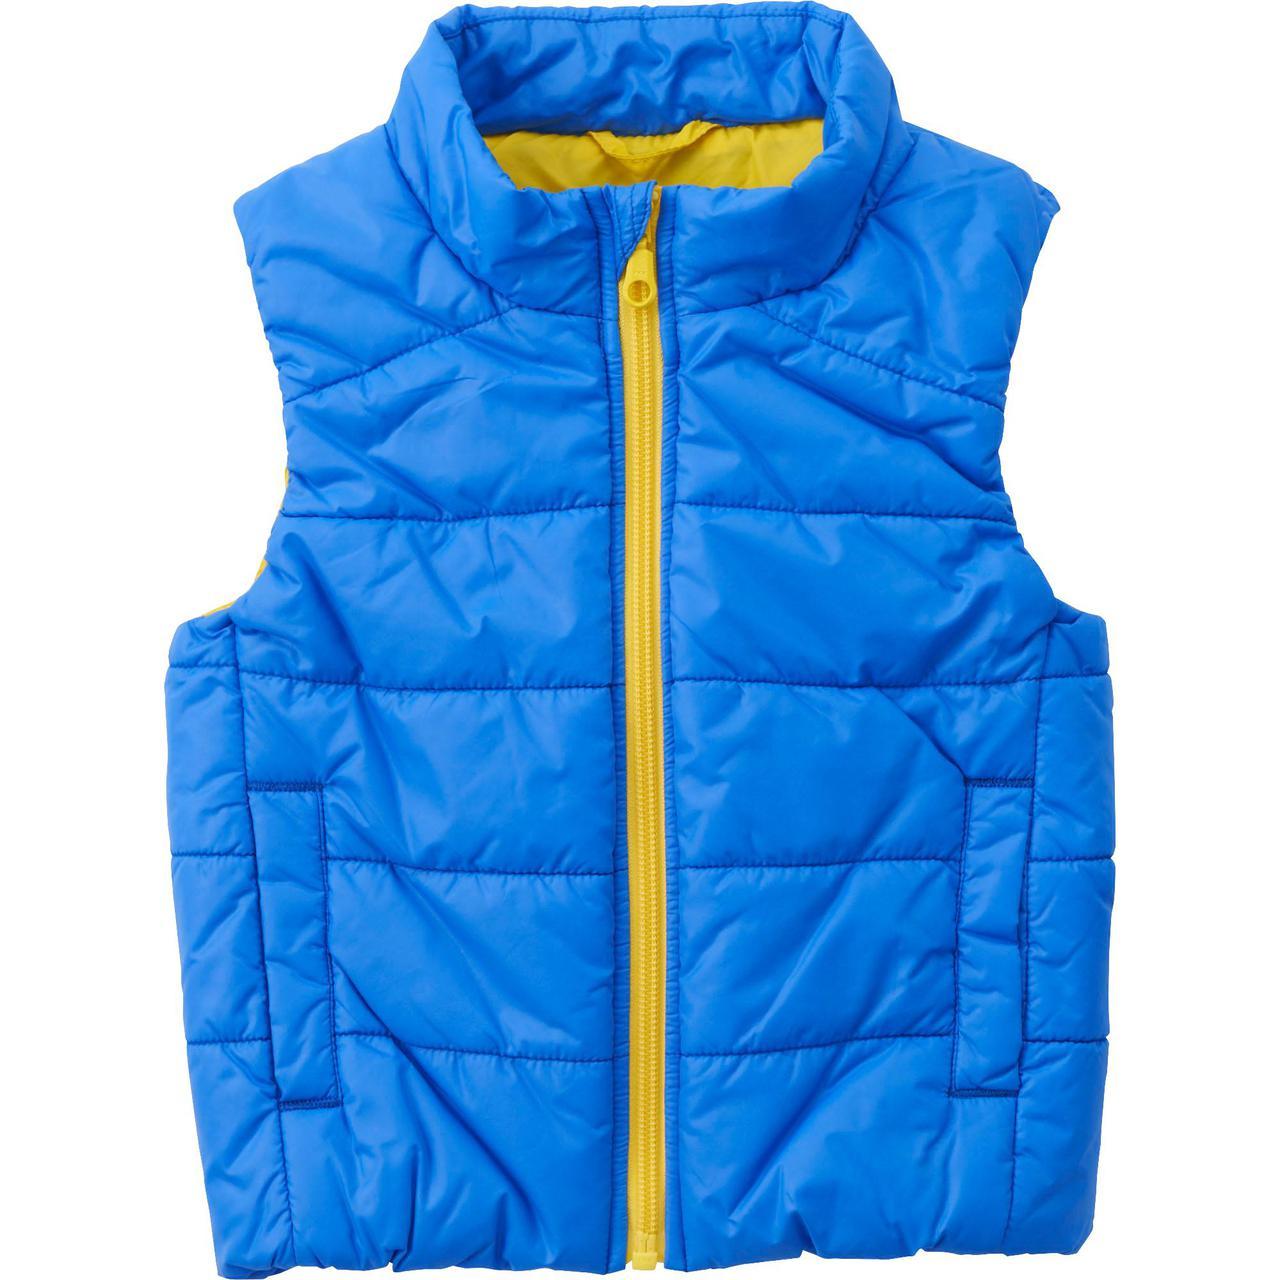 Детская жилетка дутая Uniqlo toddler body warm lite full-zip vest Blue